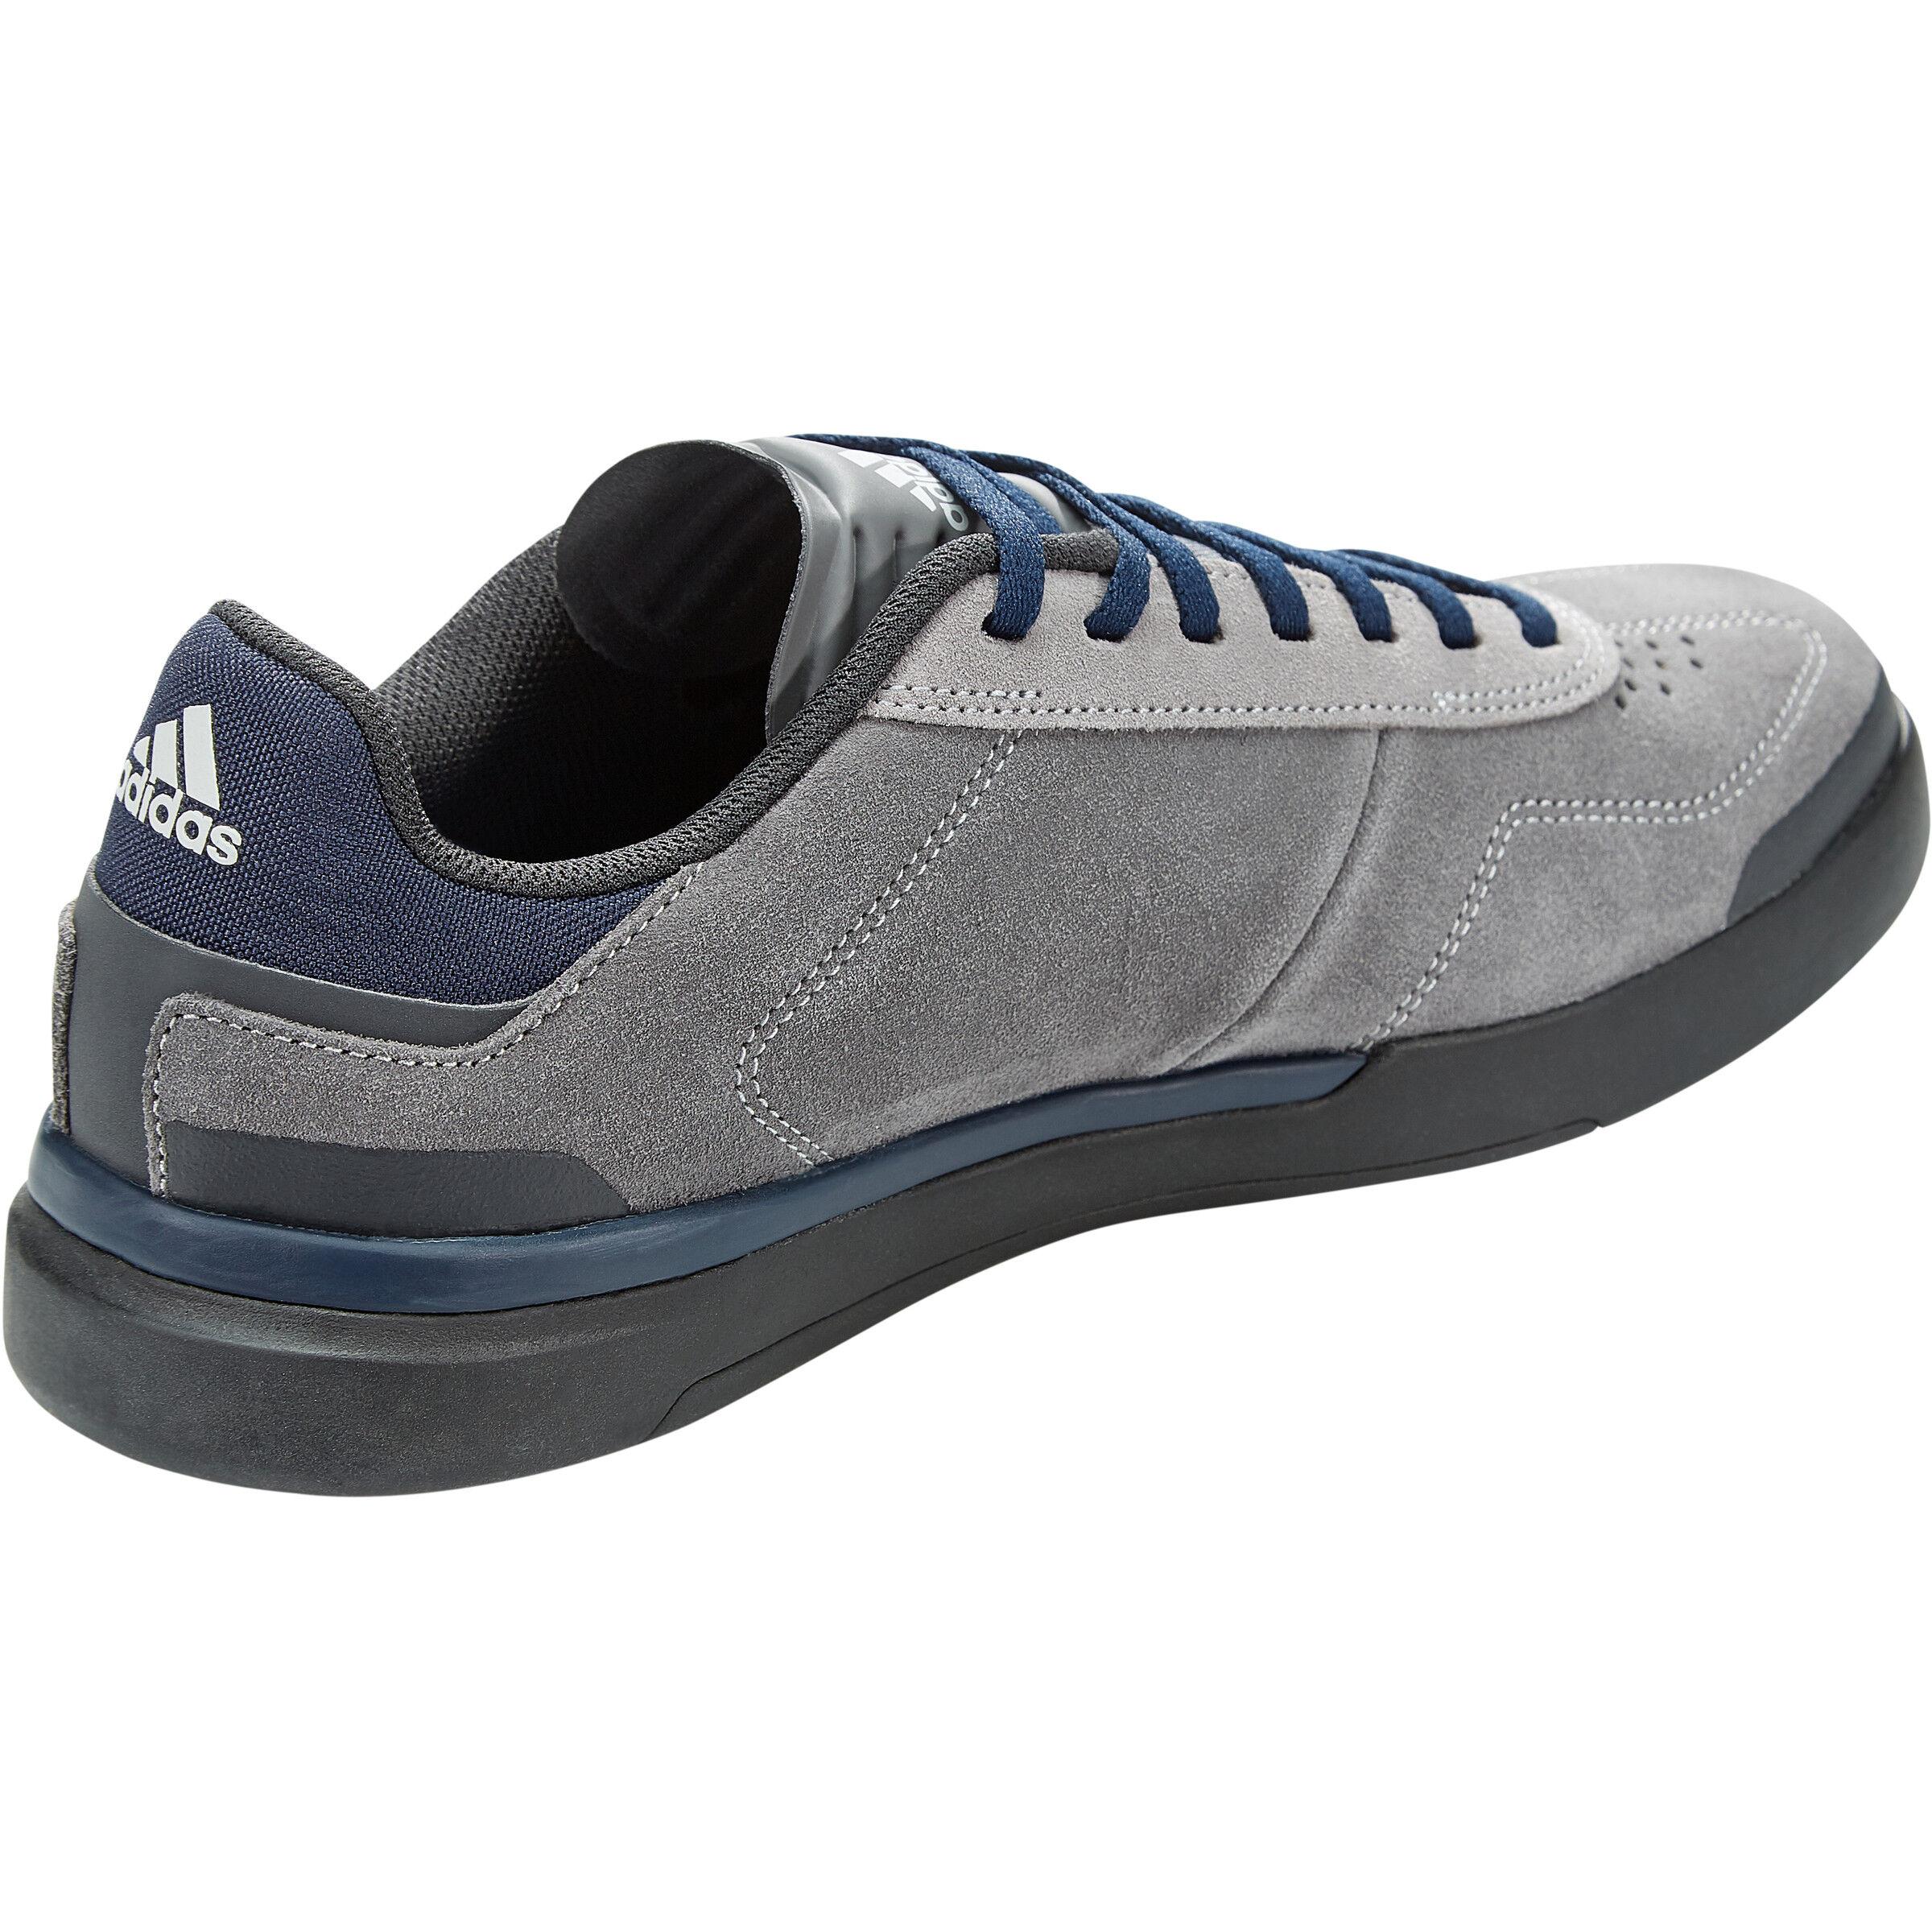 adidas Five threeclear Cut Schuhe Herren DLX grey Sleuth TLD Ten navy Low greycollegiate hrstQd